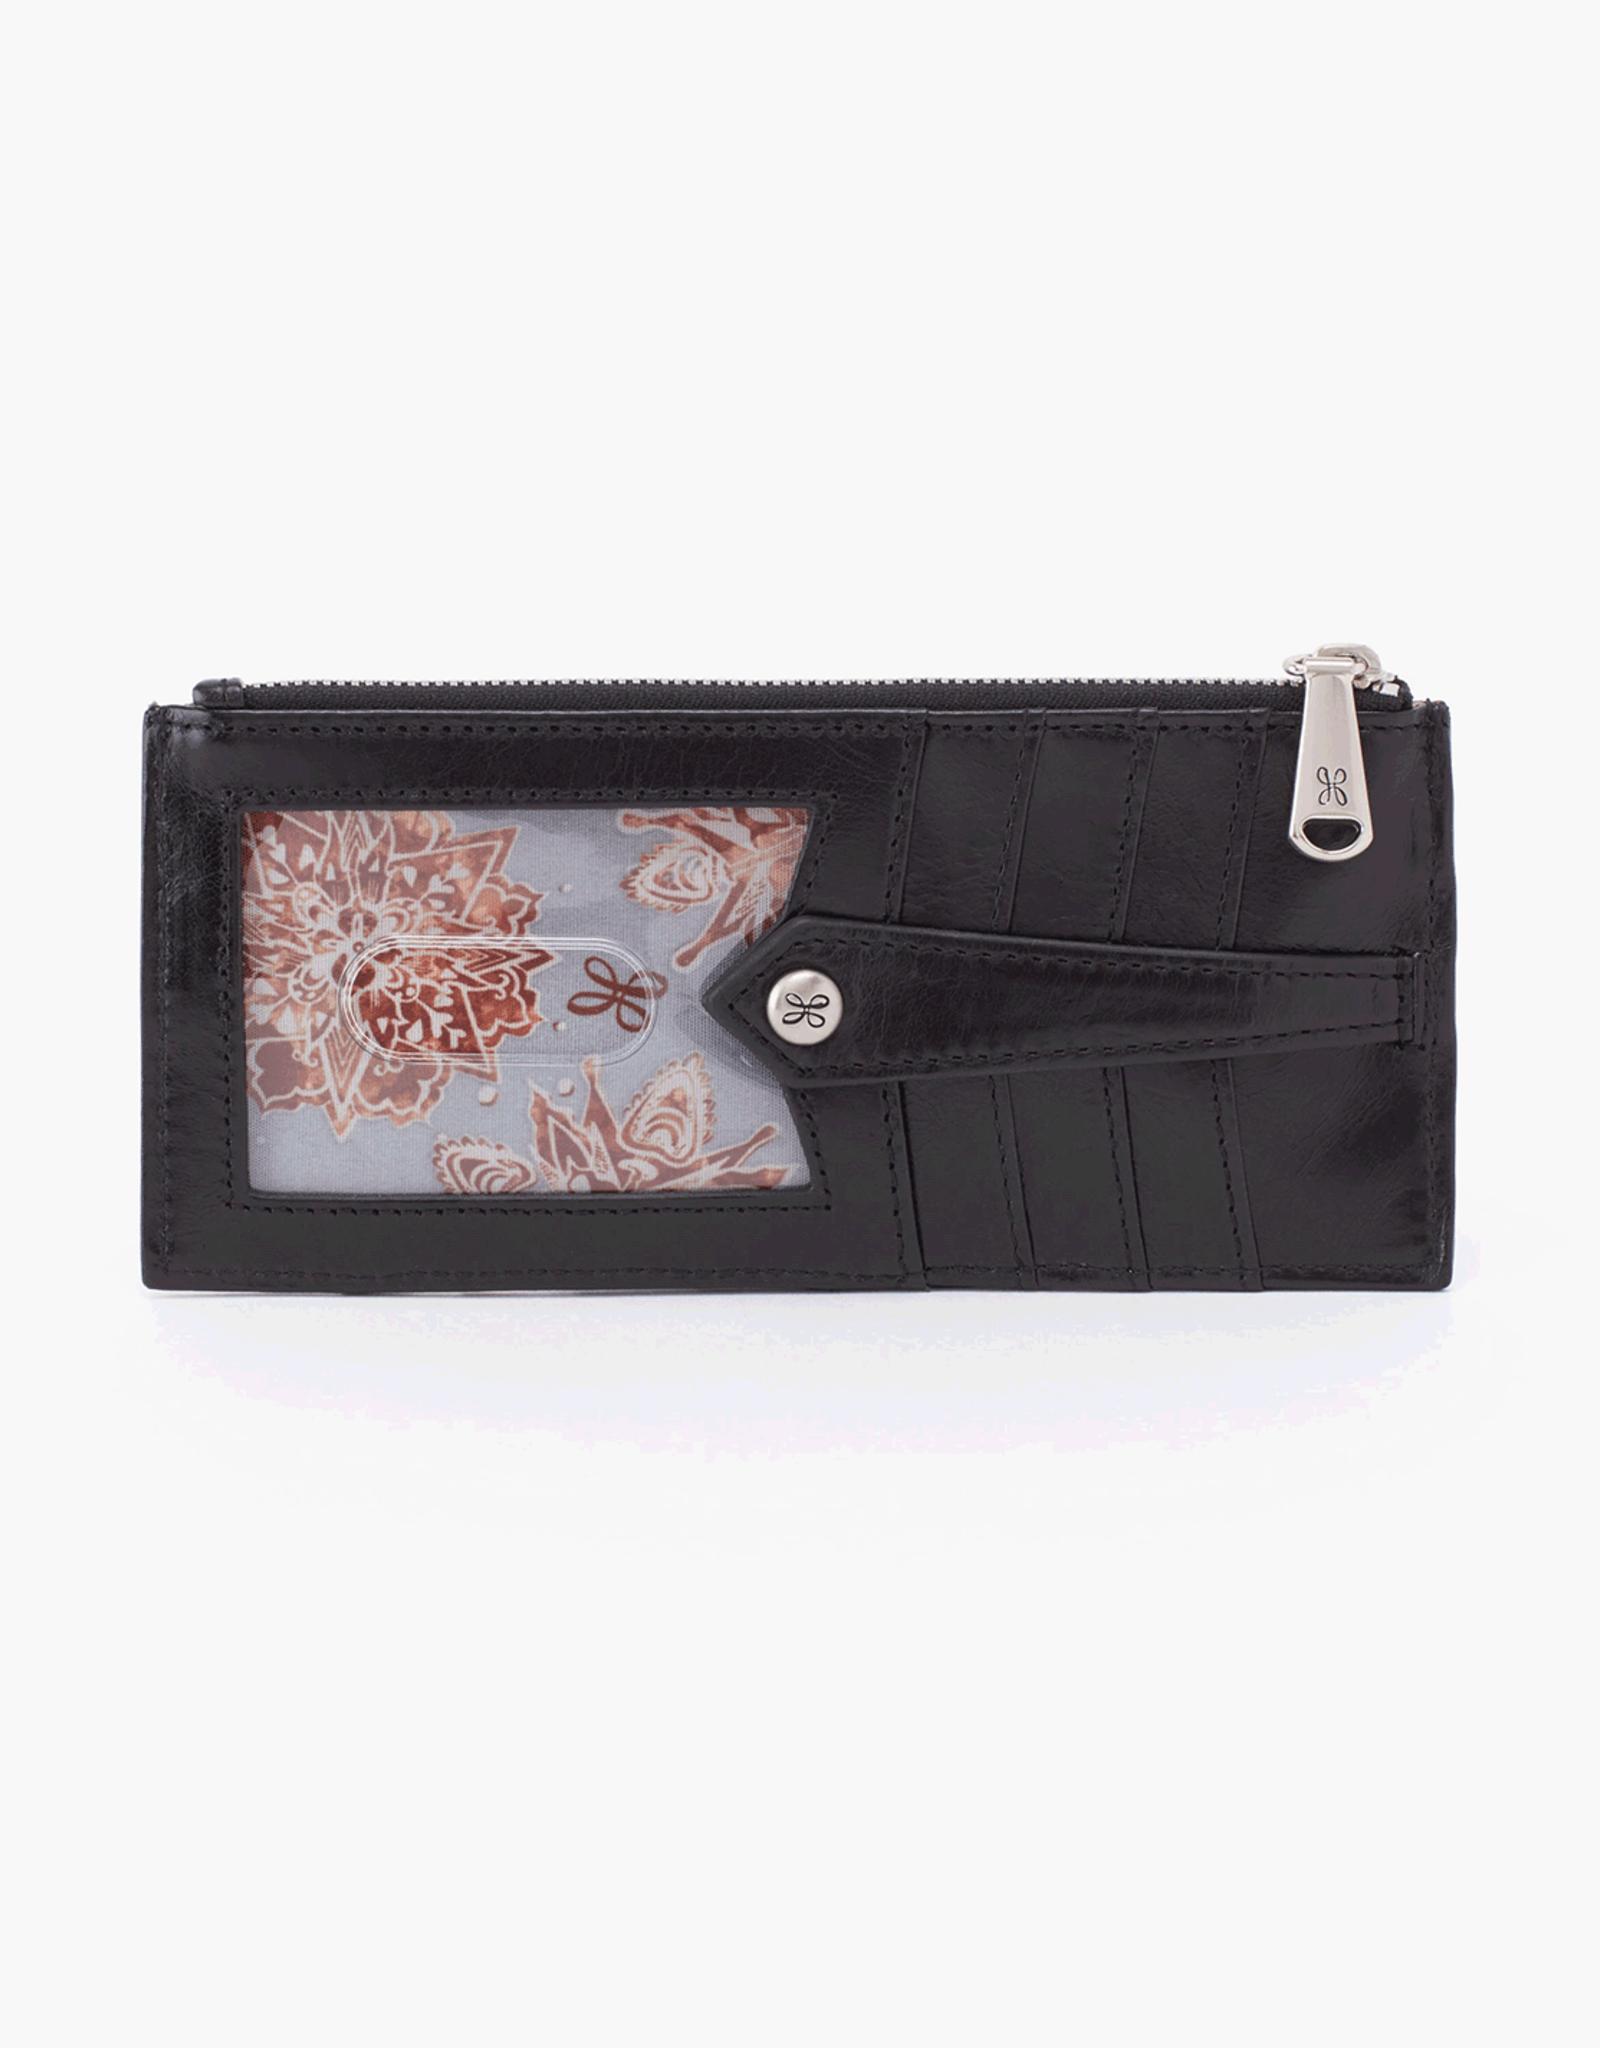 Hobo Linn Credit Card Wallet